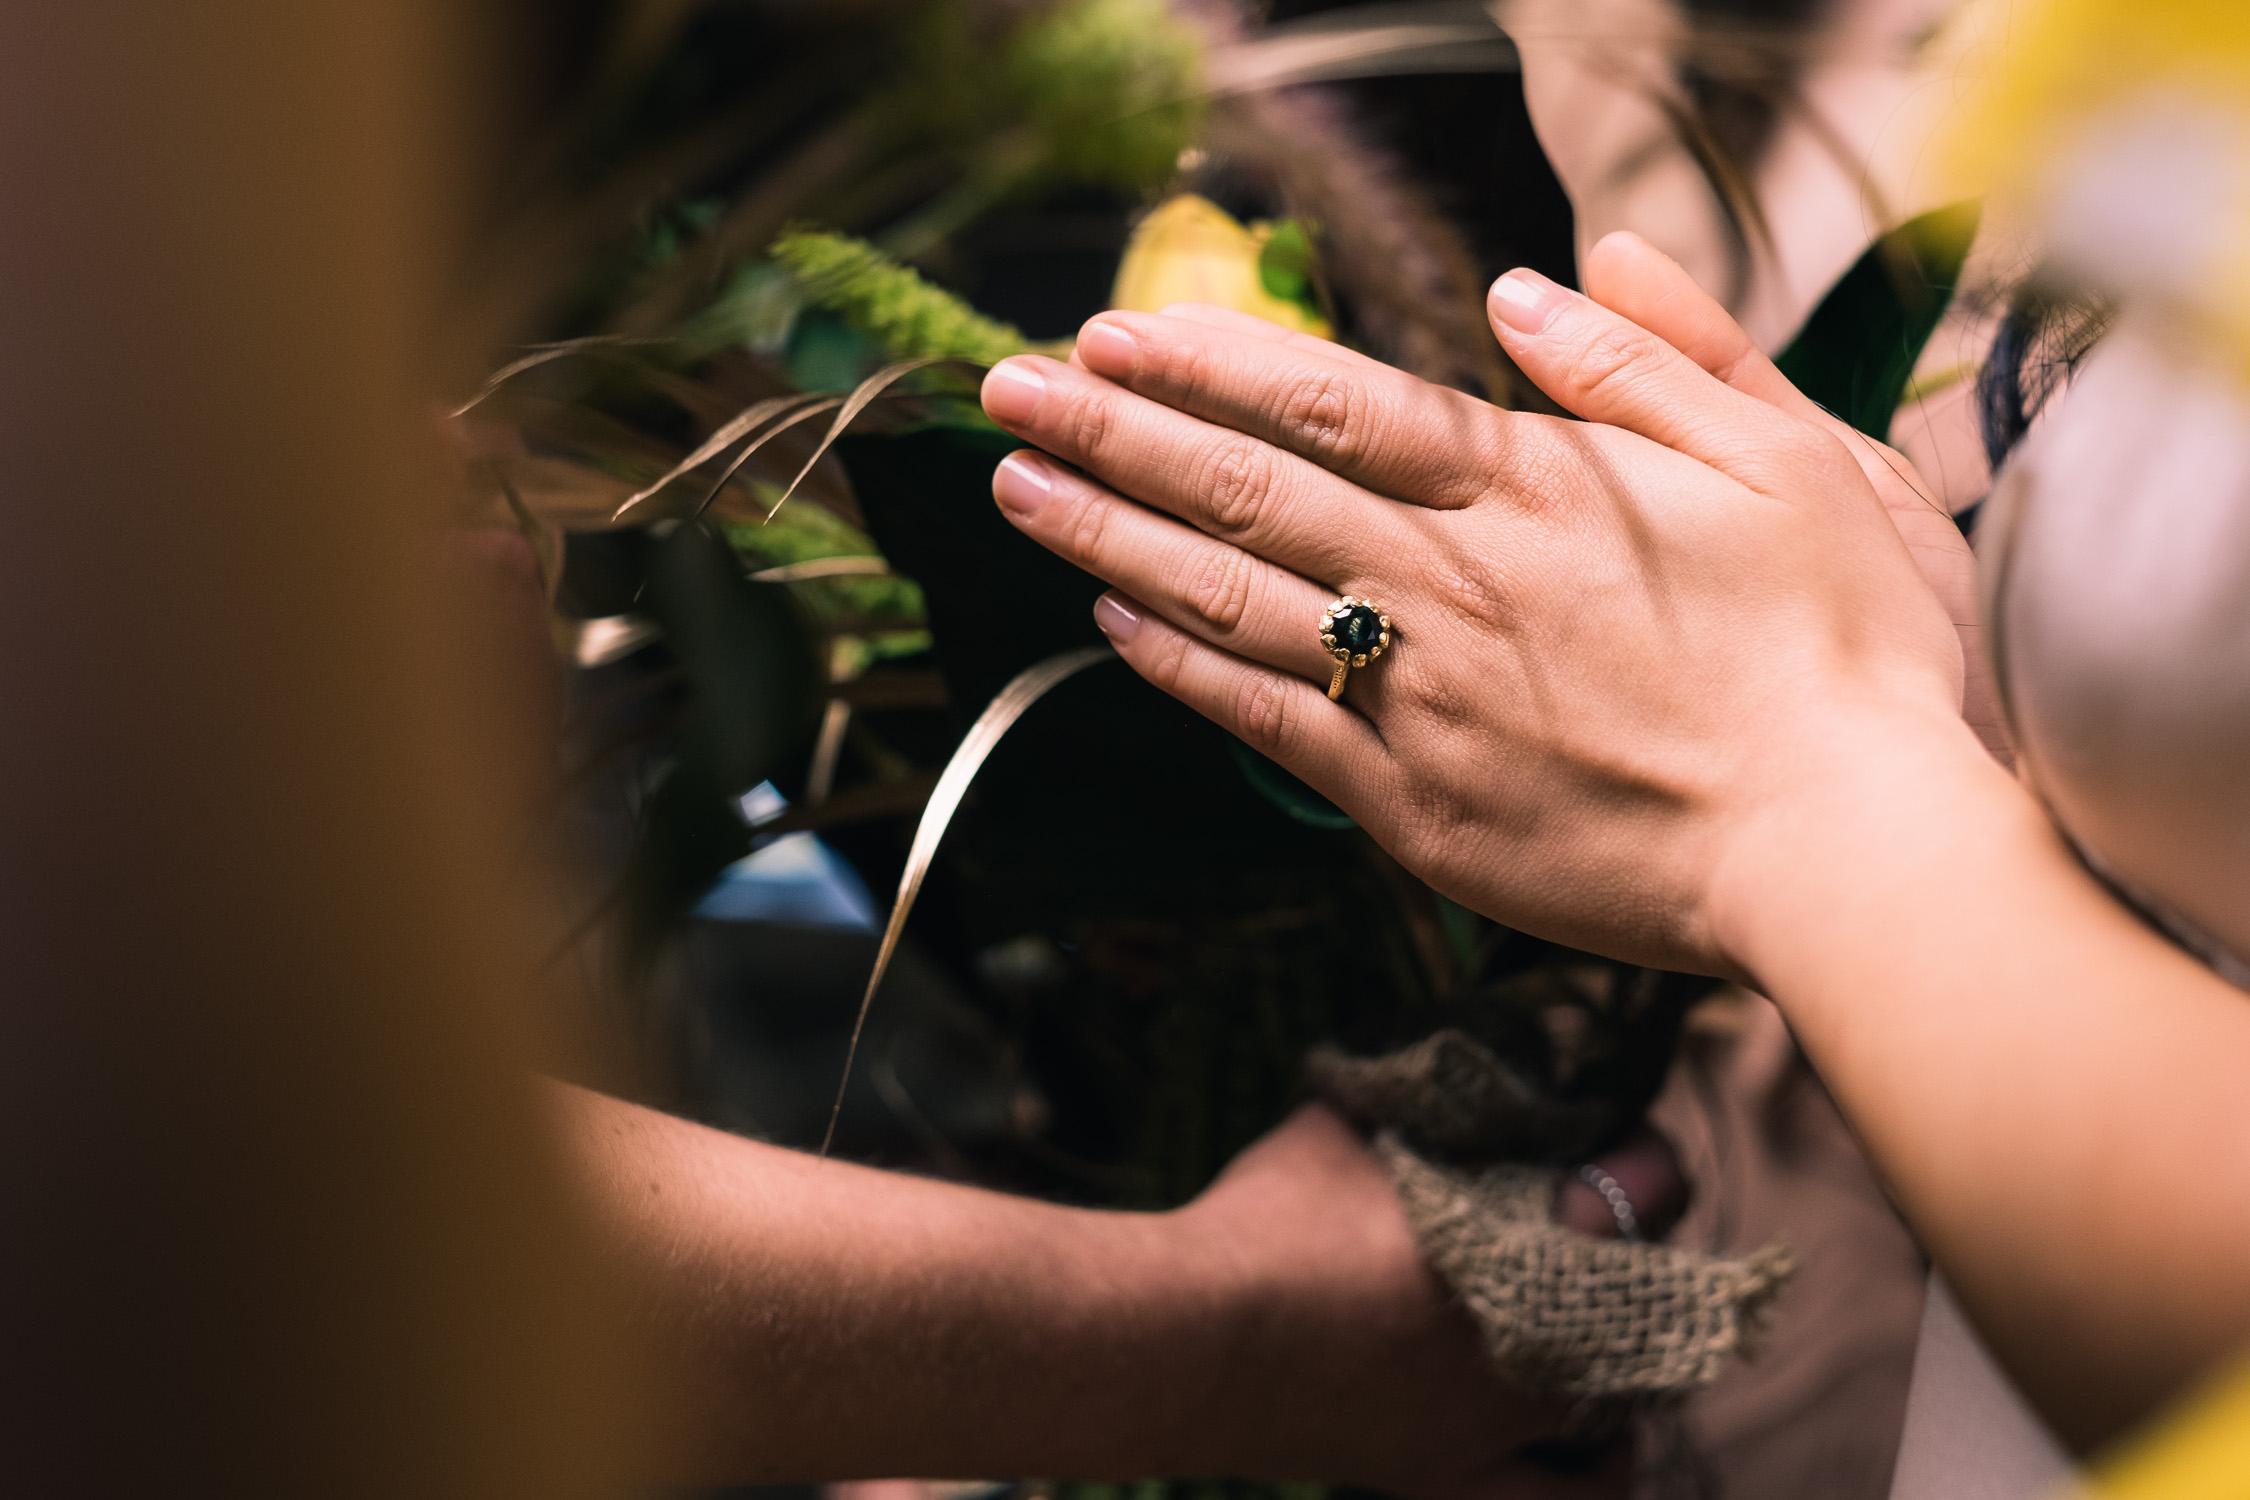 Melbourne Sunnystones Camp Wedding - Bride and bridesmaid praying before ceremony